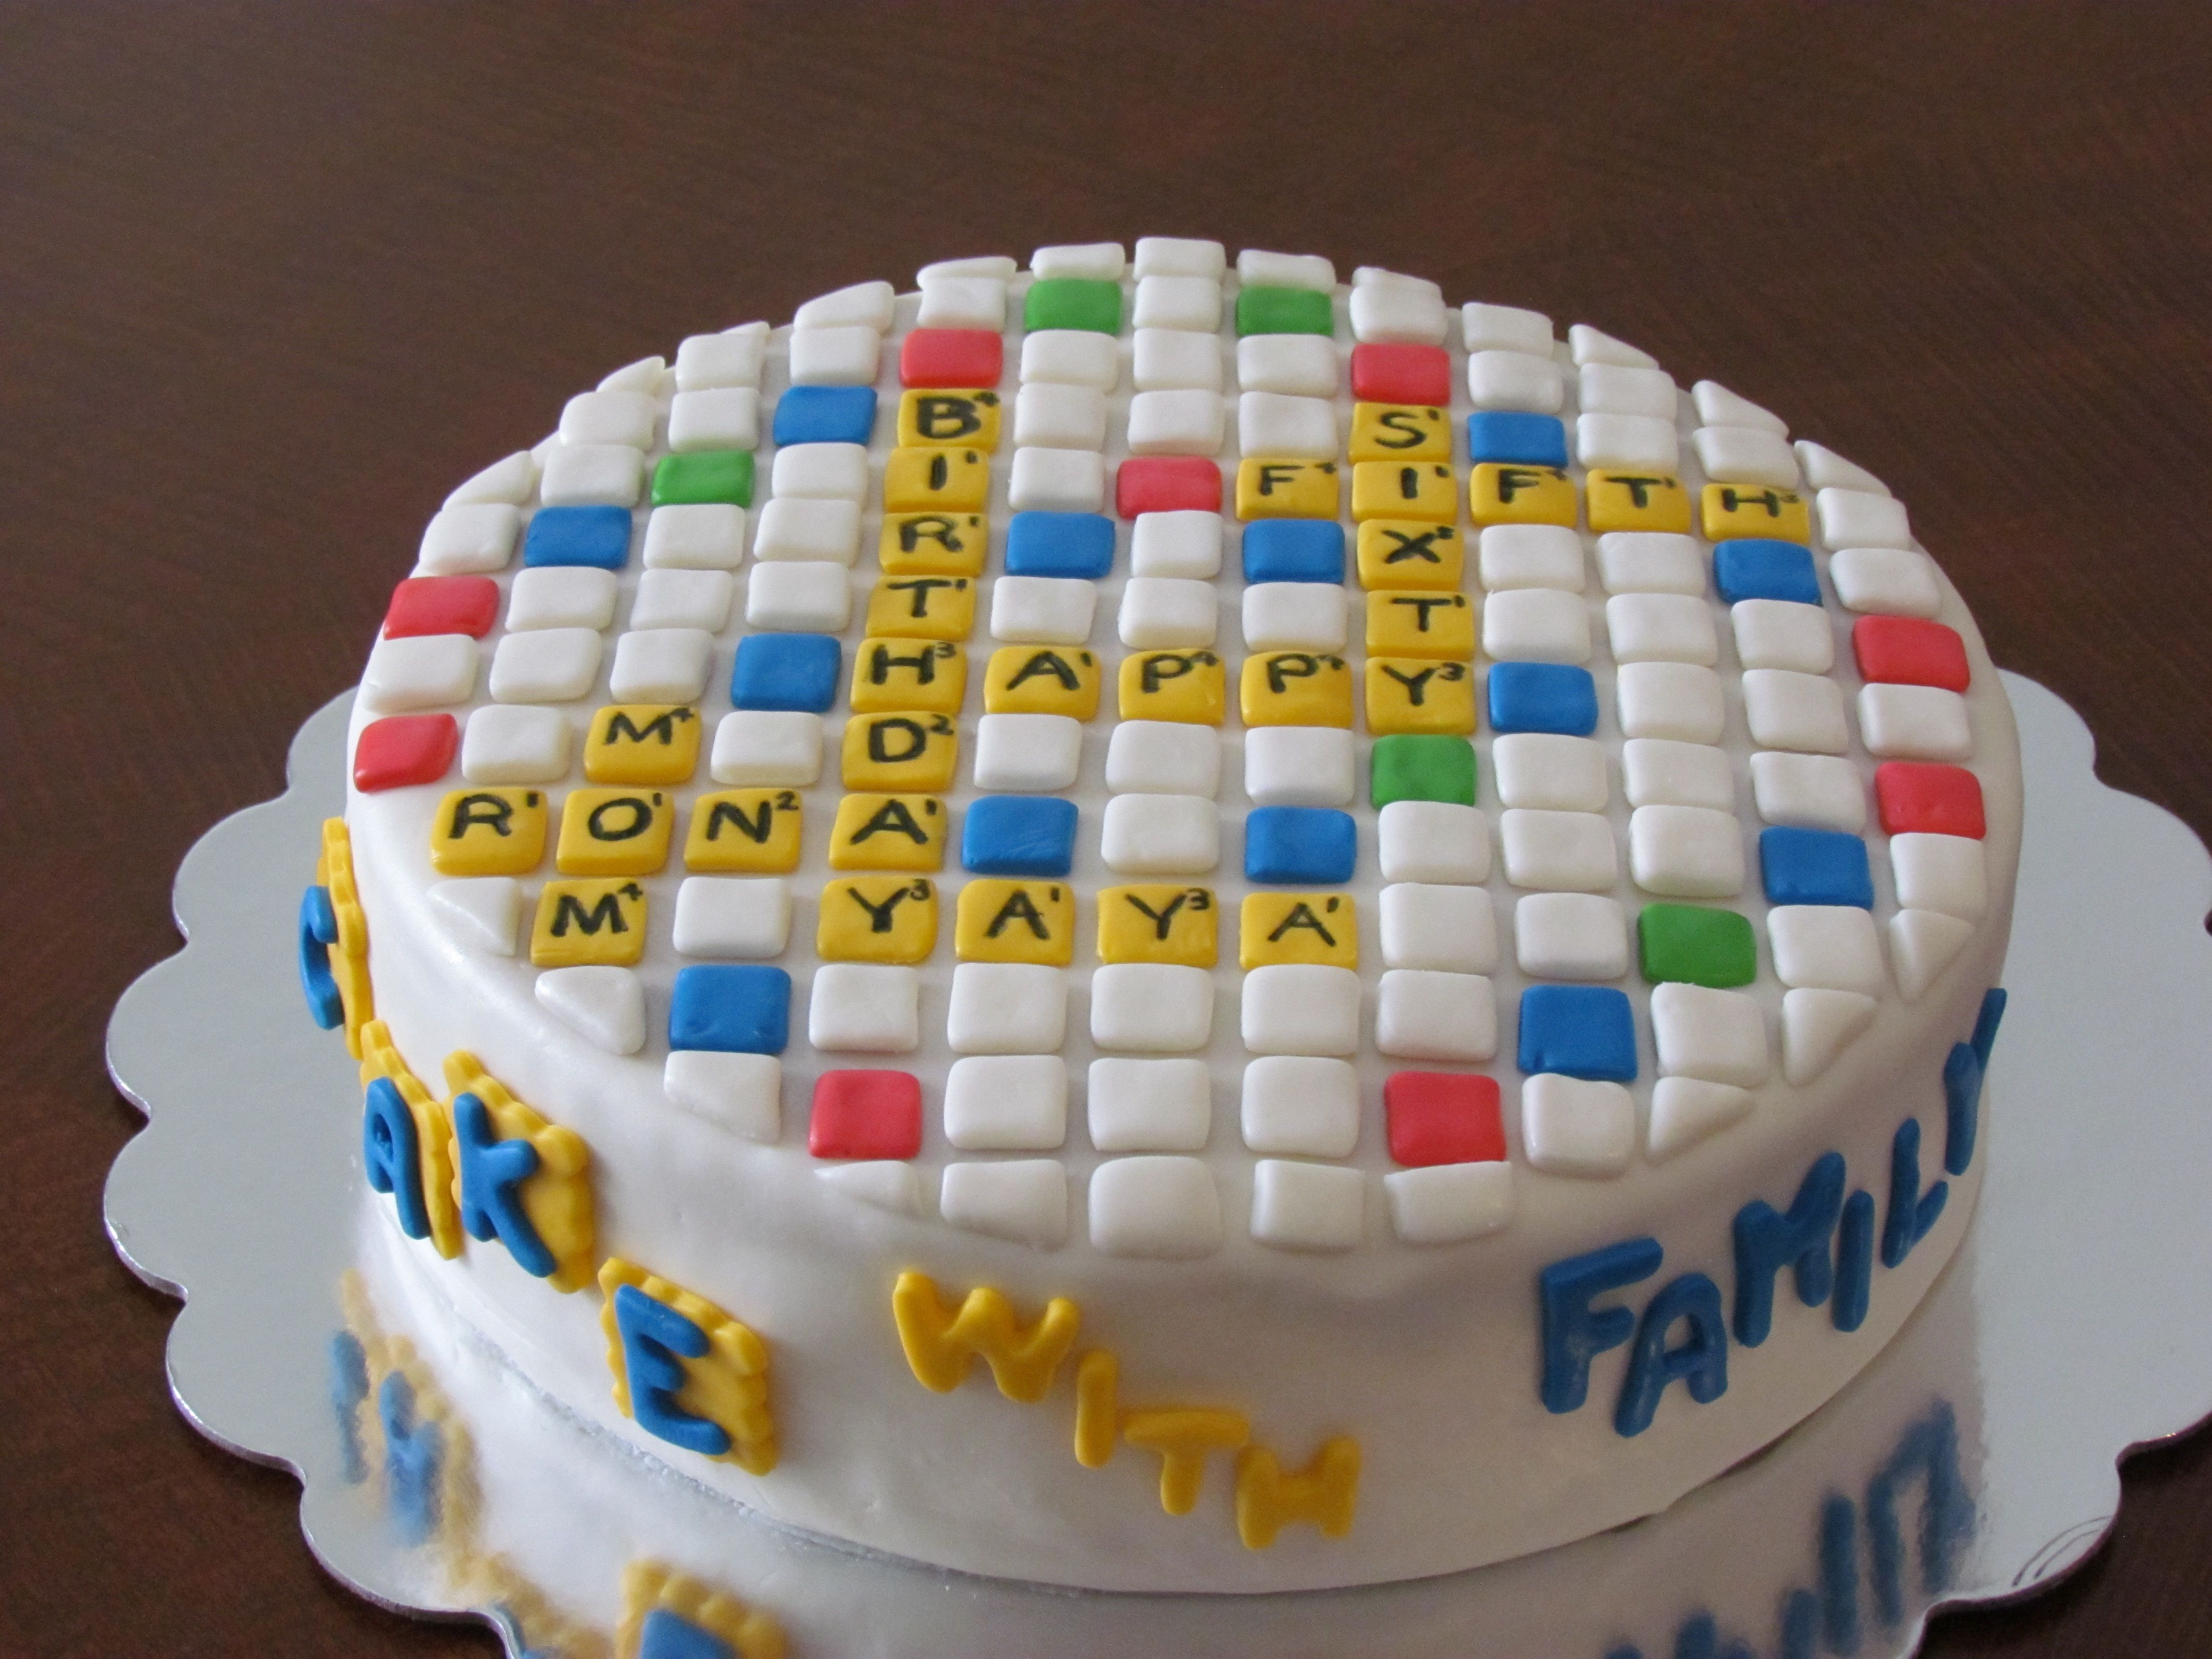 Outstanding Words With Friends Birthday Cake With Images Friends Birthday Funny Birthday Cards Online Necthendildamsfinfo